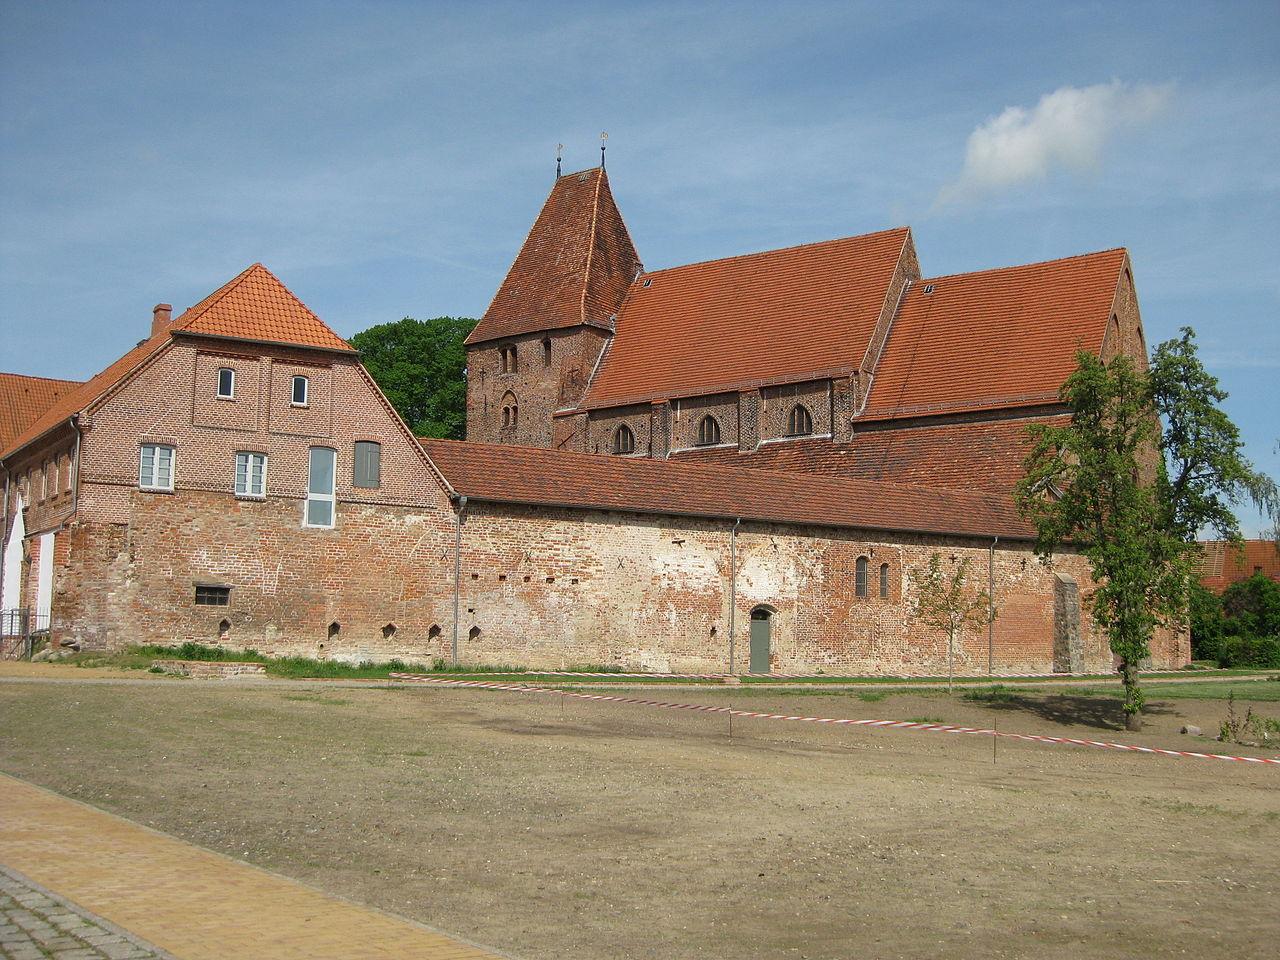 Bild Kloster Rehna